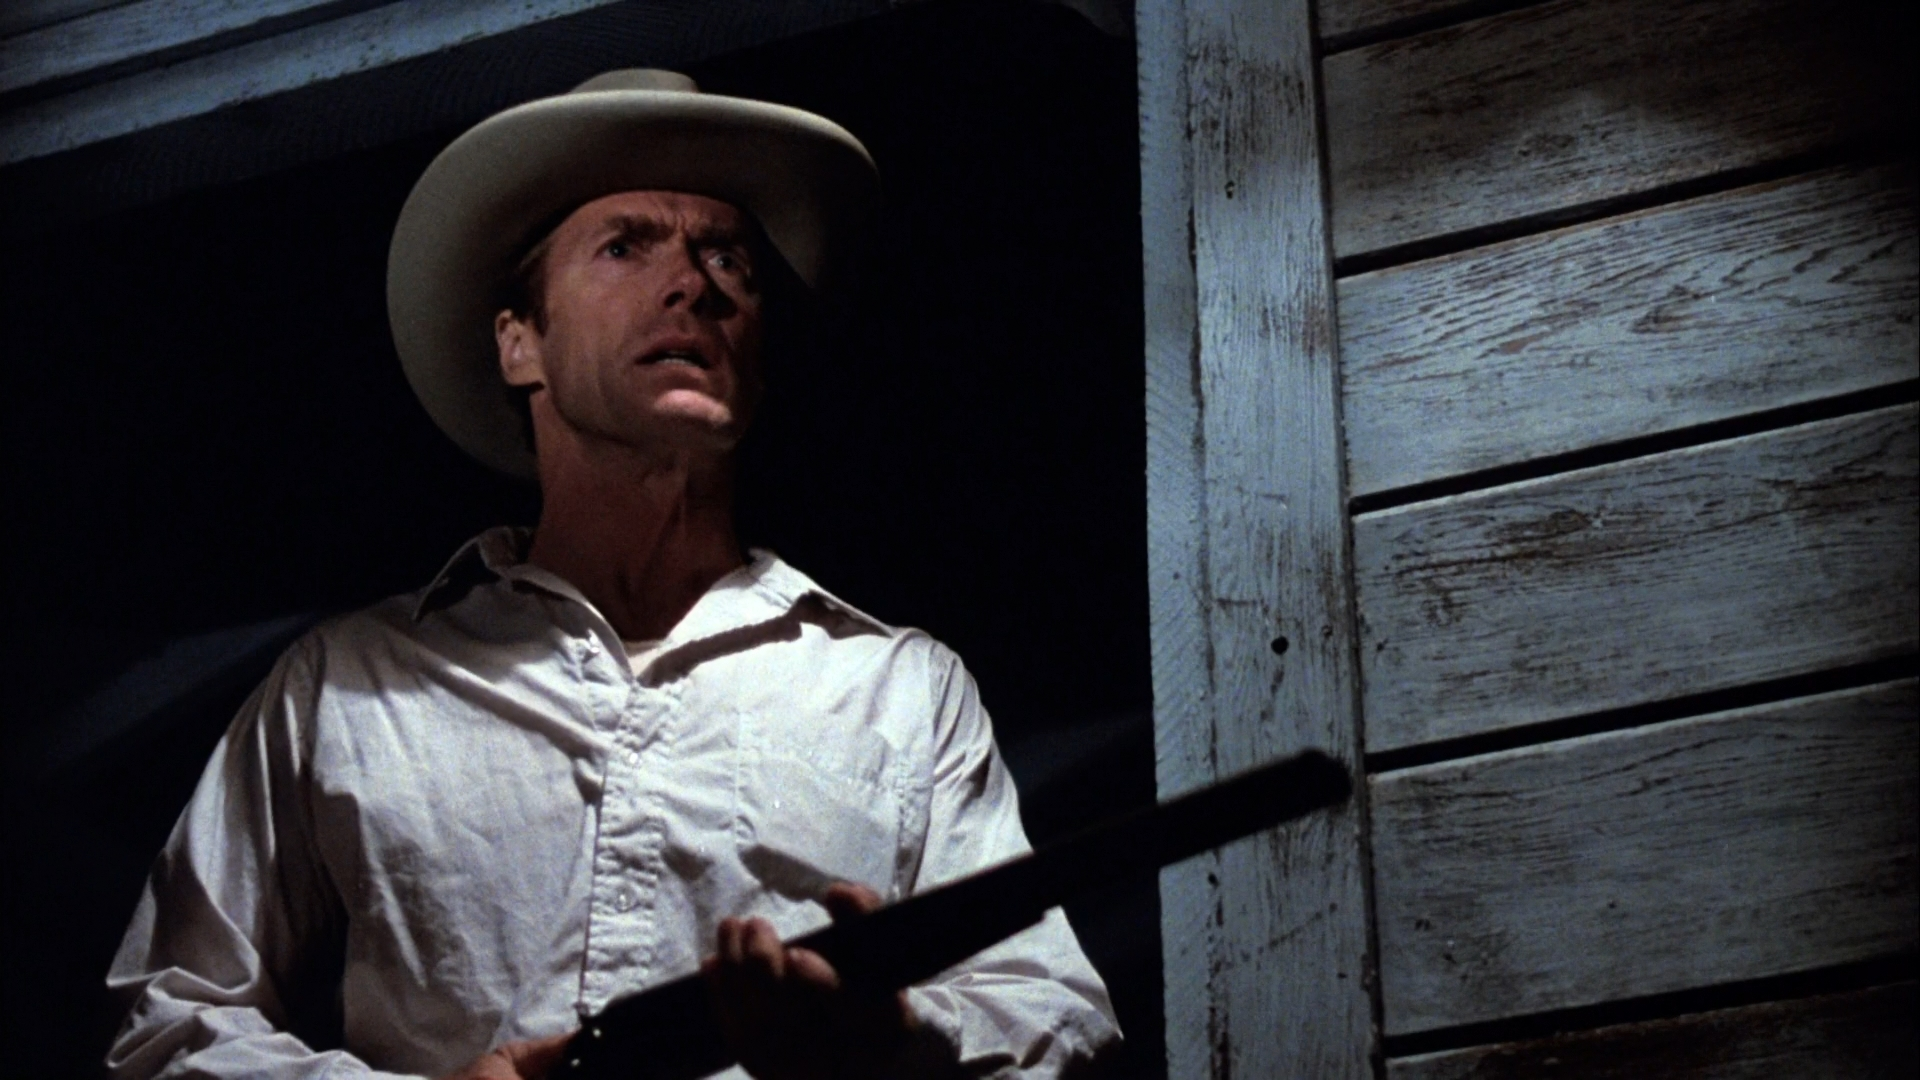 Поющий по кабакам (1982) Клинт Иствуд